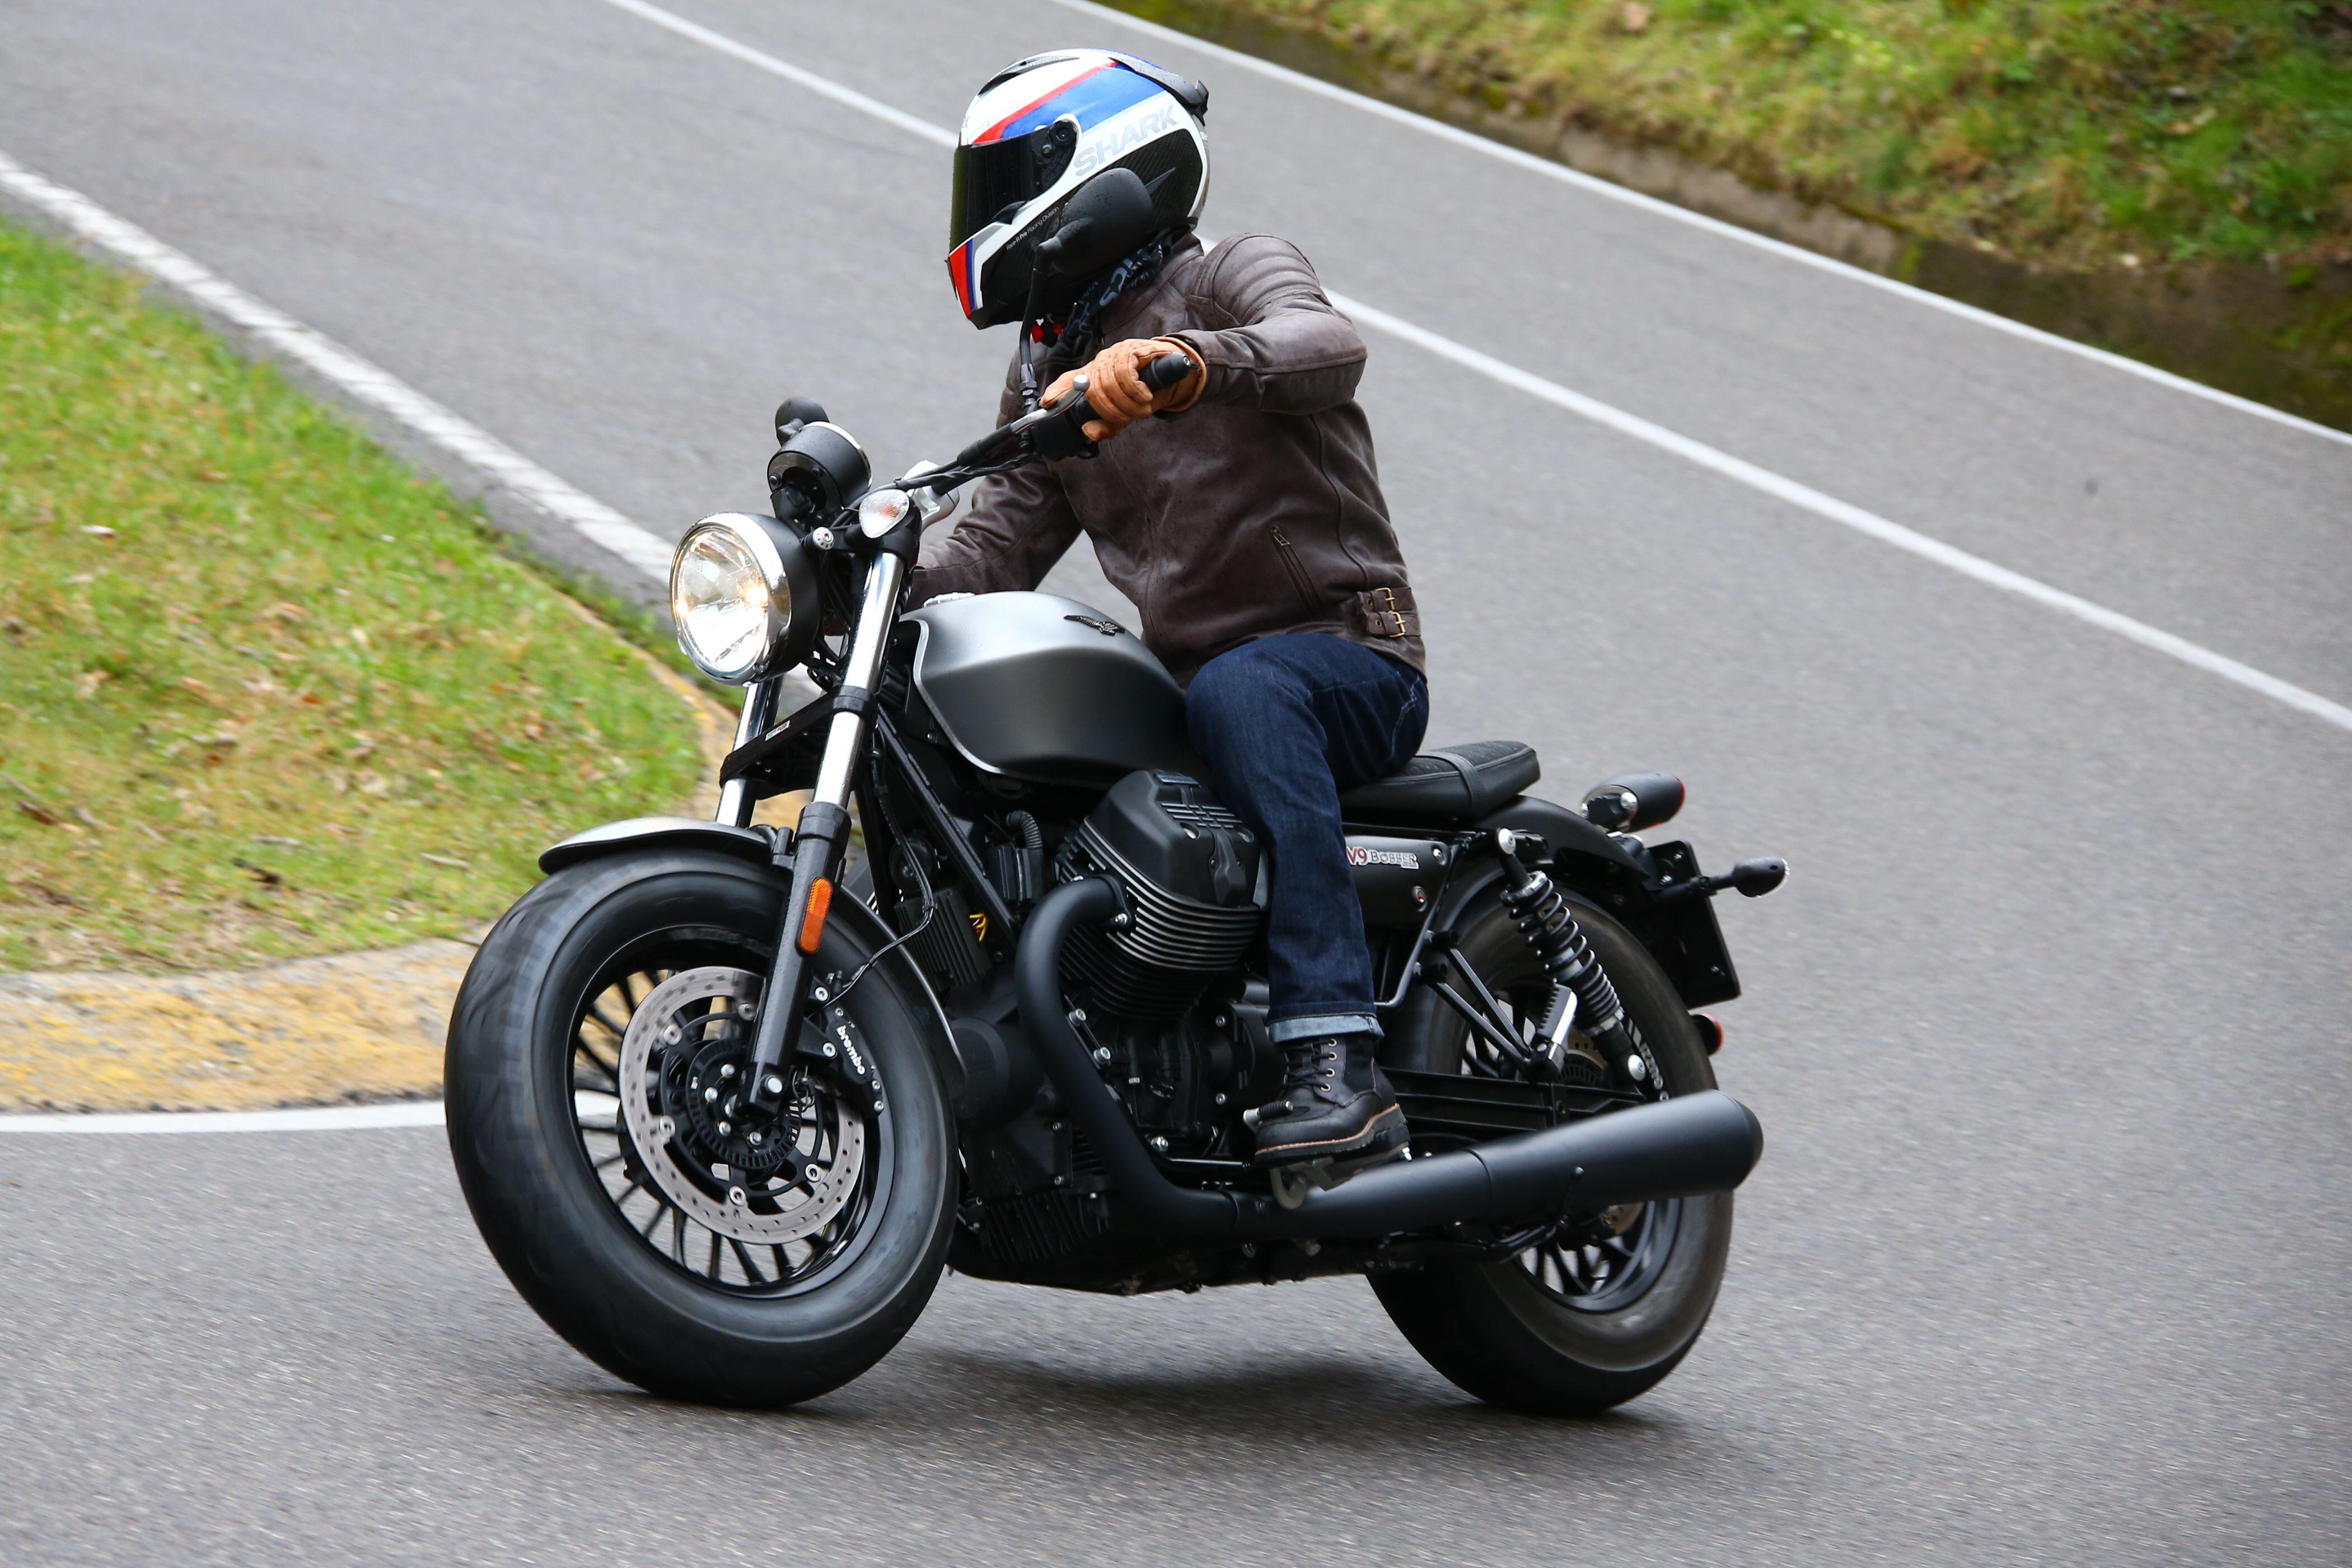 first ride moto guzzi v9 review visordown. Black Bedroom Furniture Sets. Home Design Ideas